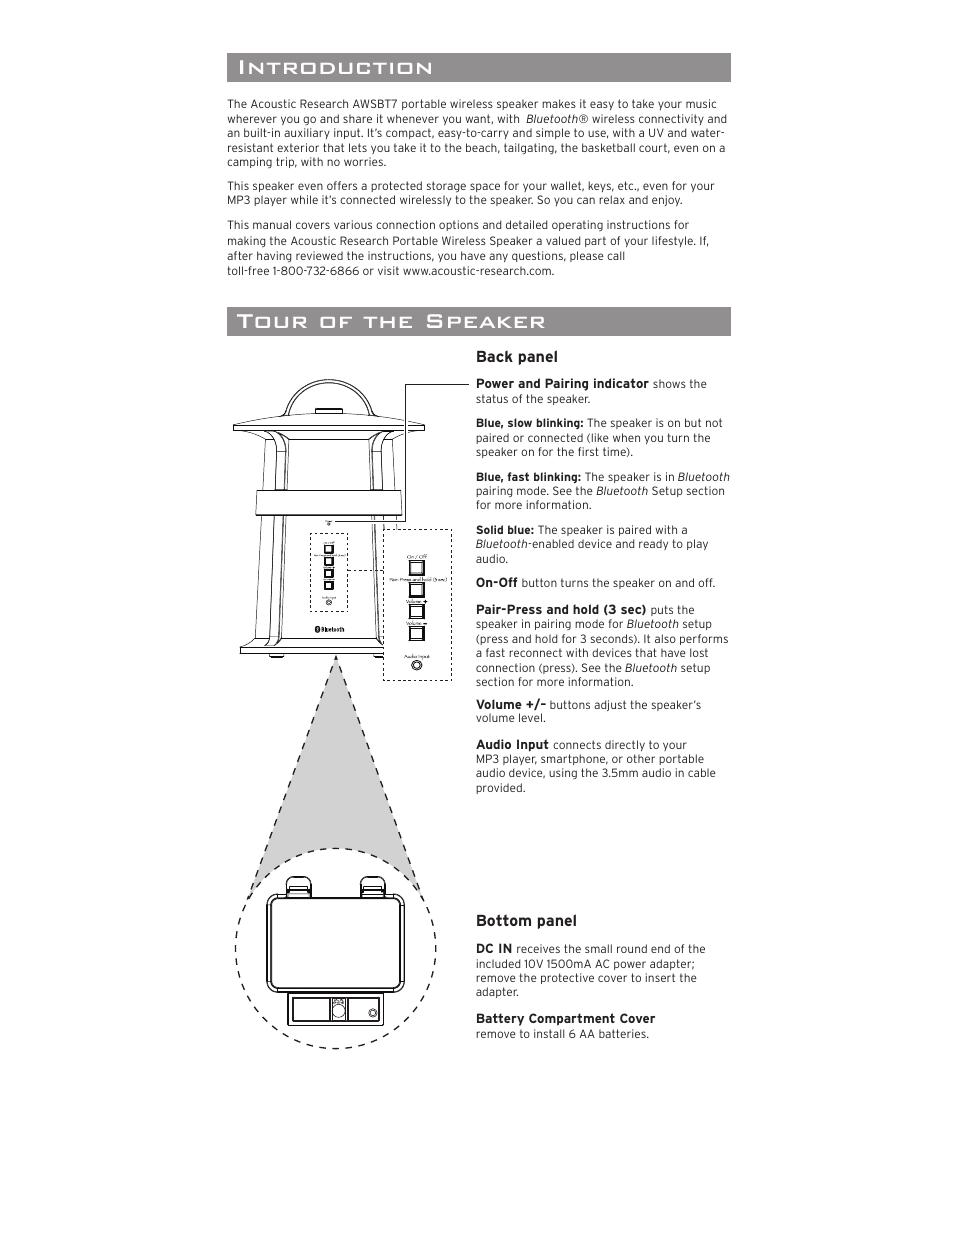 portable wireless speaker introduction important information rh manualsdir com Instruction Manual Maintenance Manual